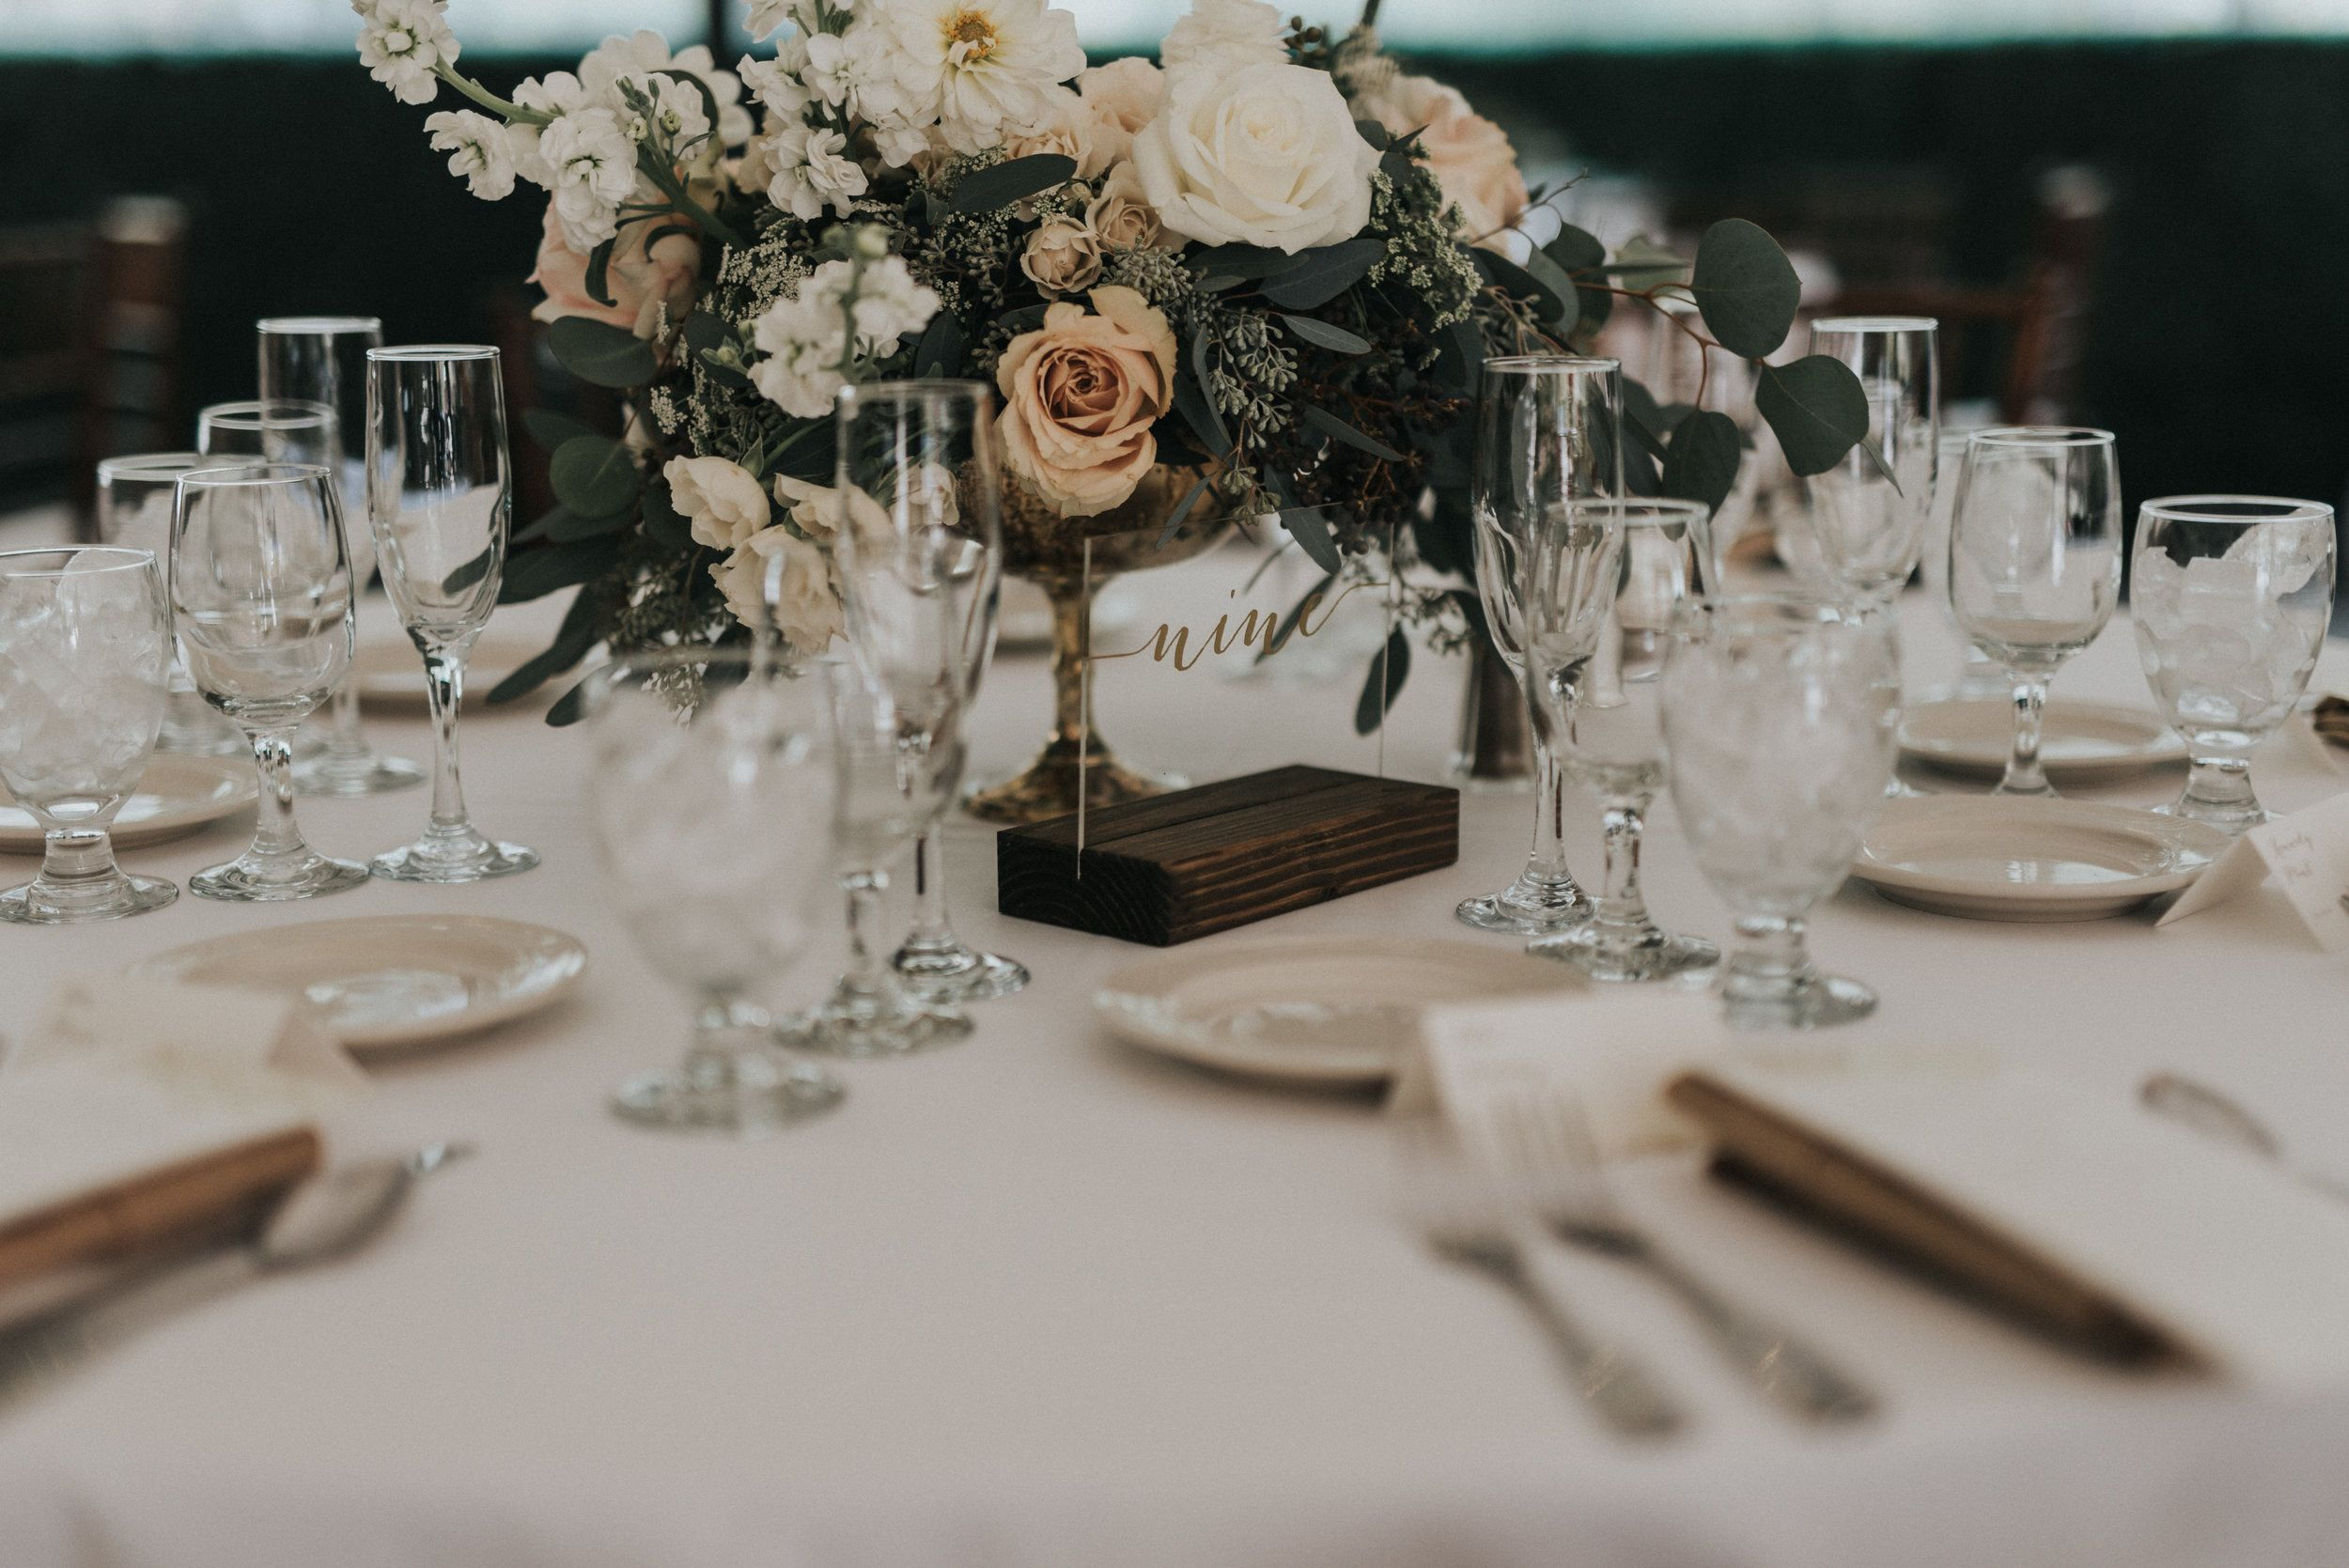 Wedding venue decorations ideas november 2018 Wedding centerpiece  Malibu Wedding  Pinterest  Wedding